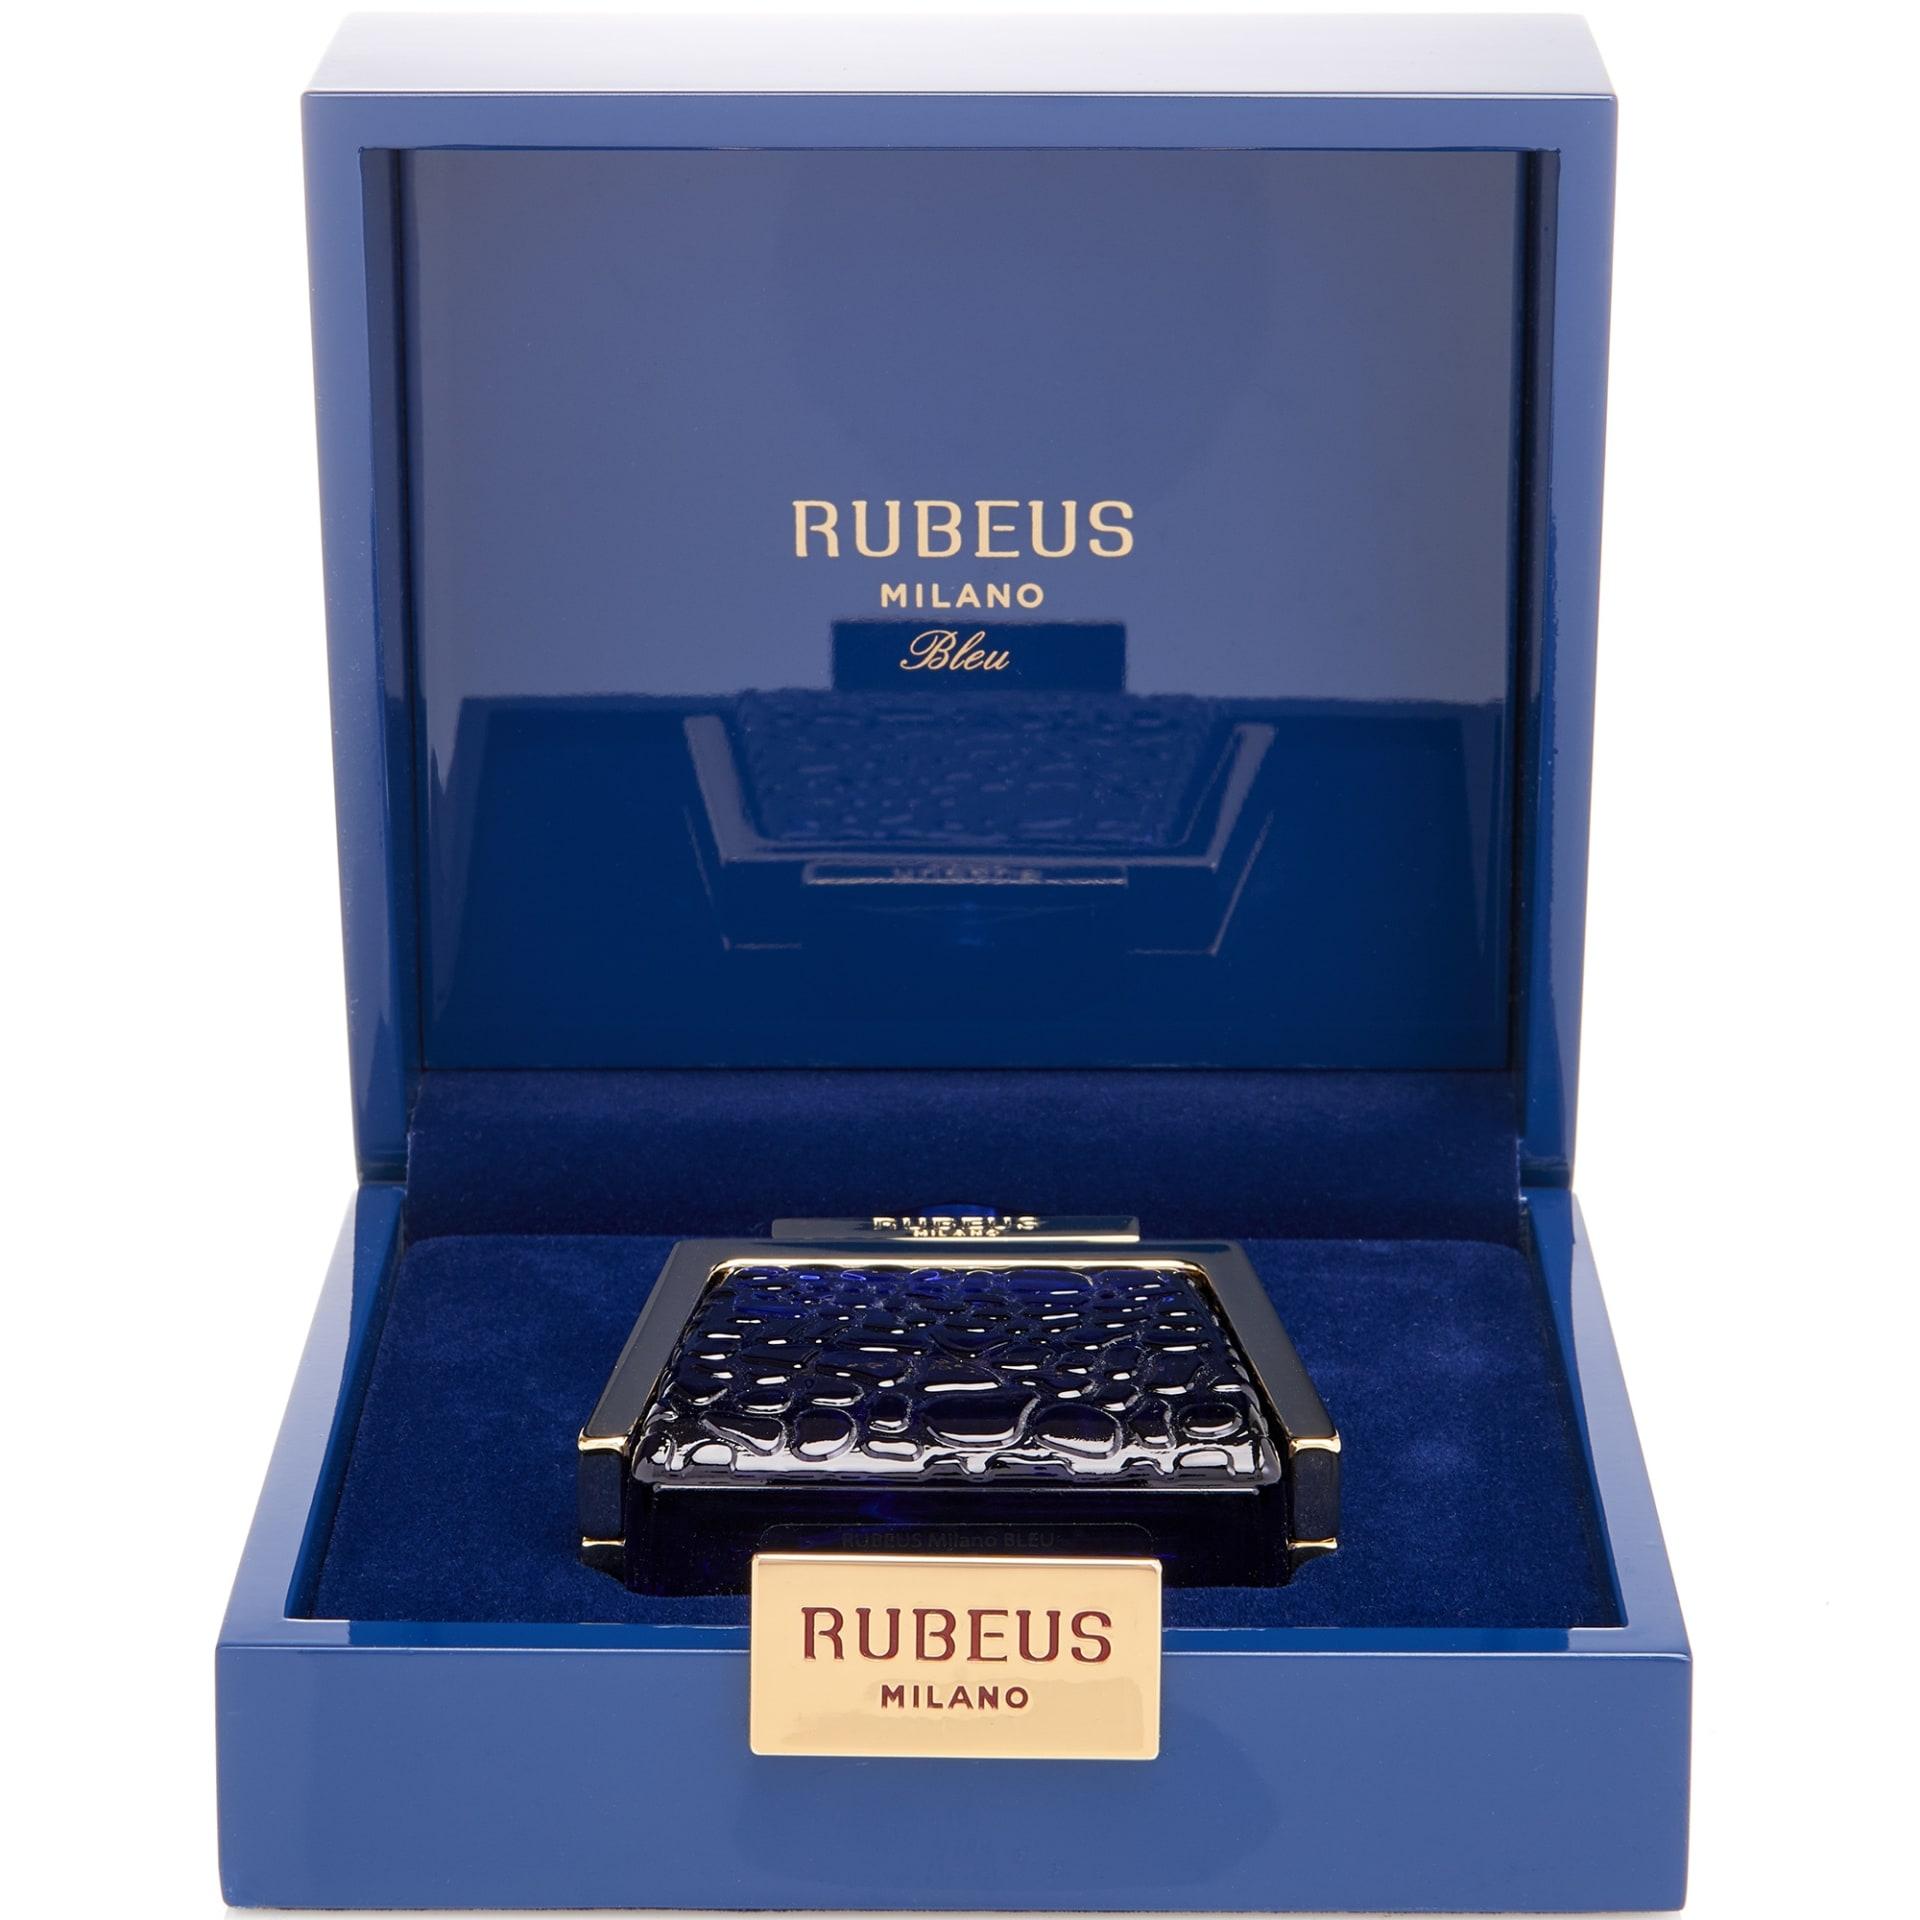 rubeus-milano-bleu-2